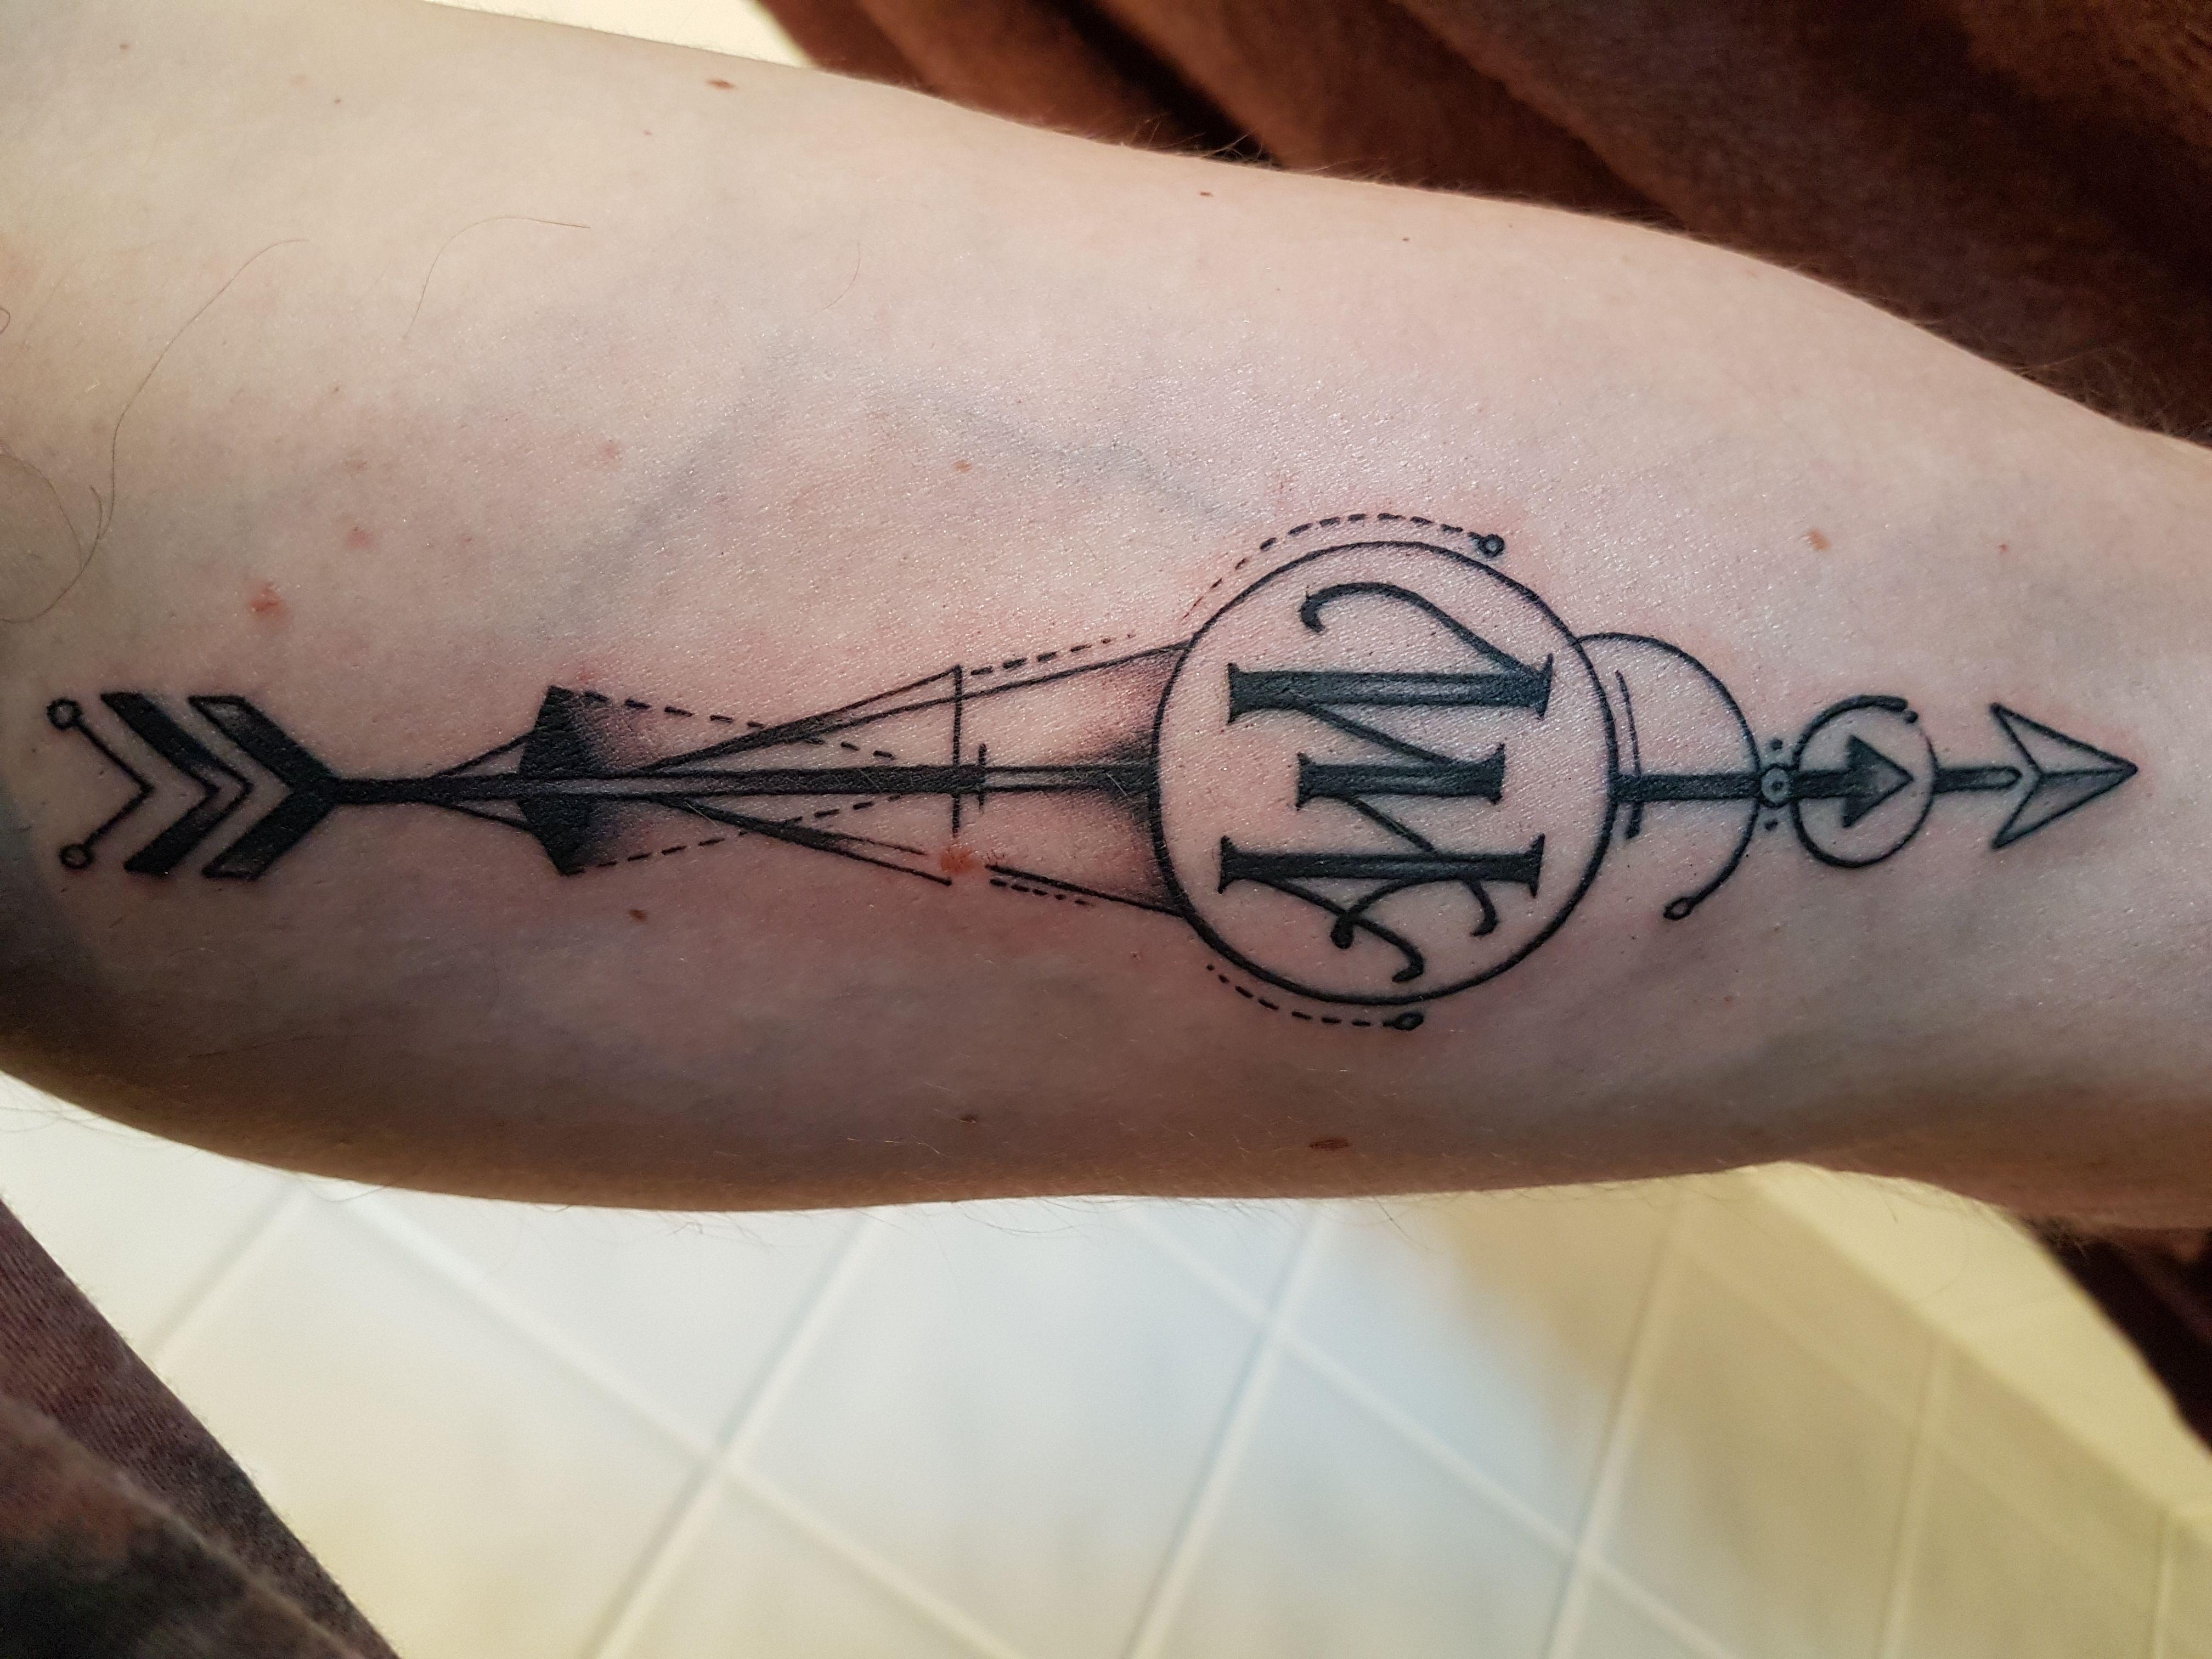 tatouages datant matchmaking vers le bas DotA 2